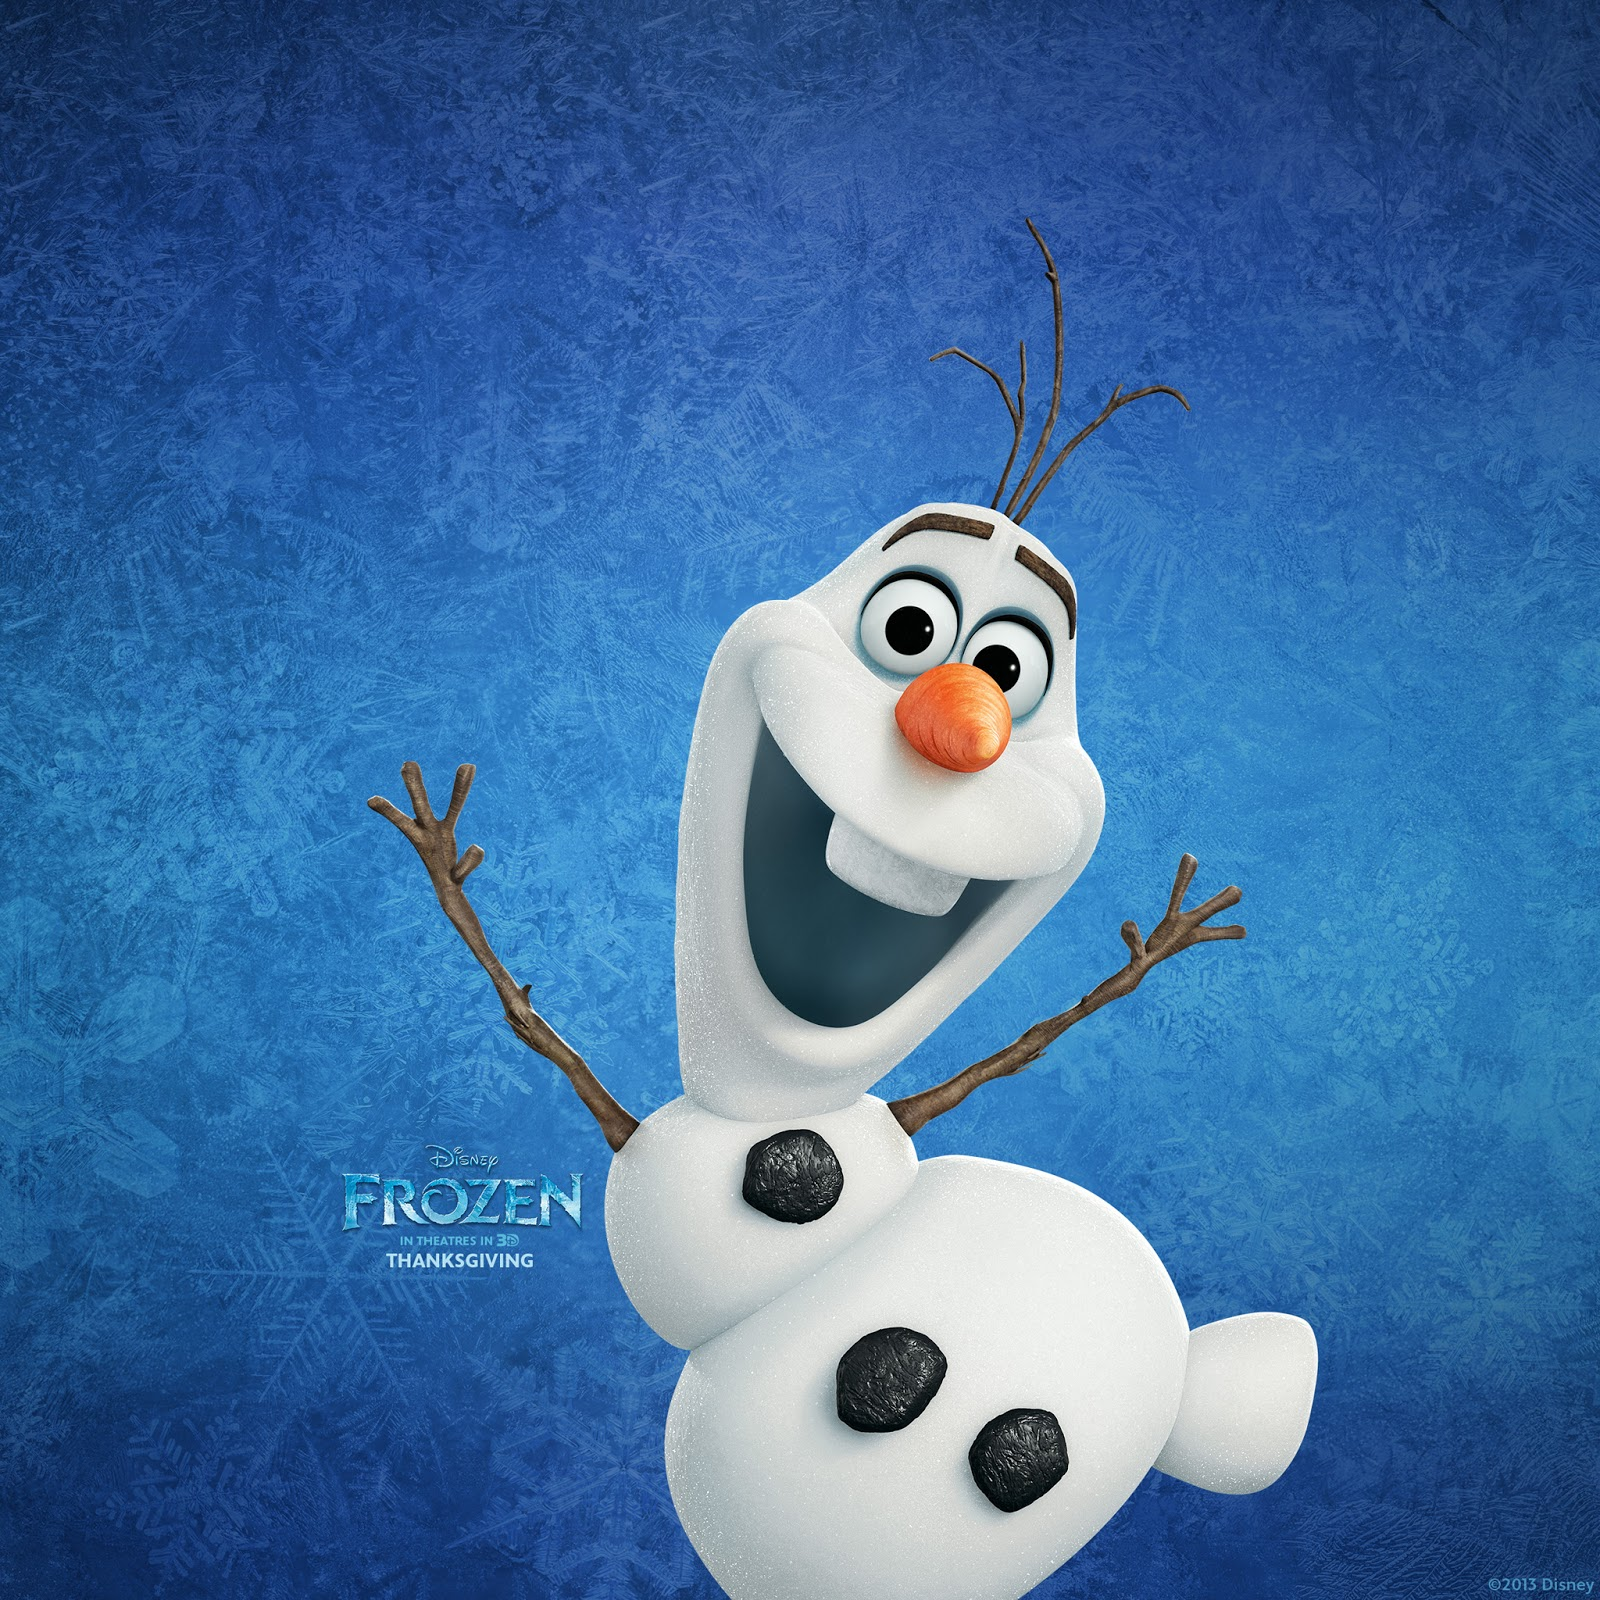 olaf wallpaper hd,snowman,animated cartoon,snow,animation